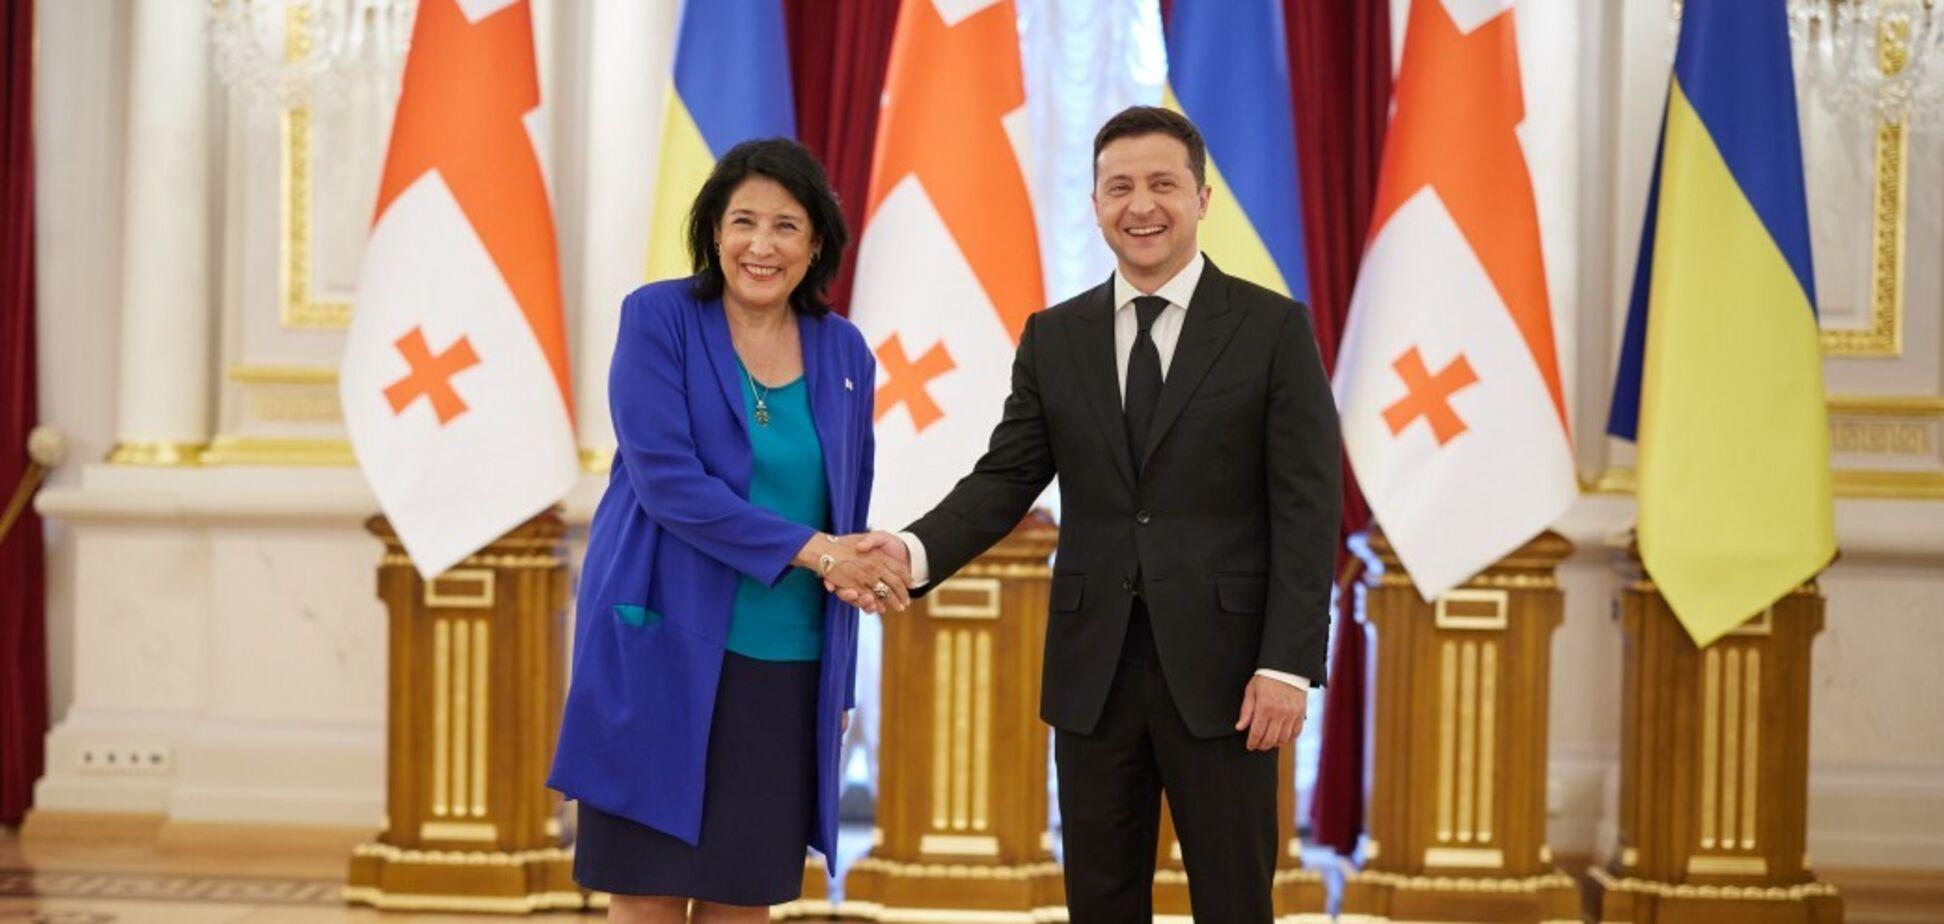 Зеленский и президент Грузии обсудили противодействие России и признание COVID-паспортов